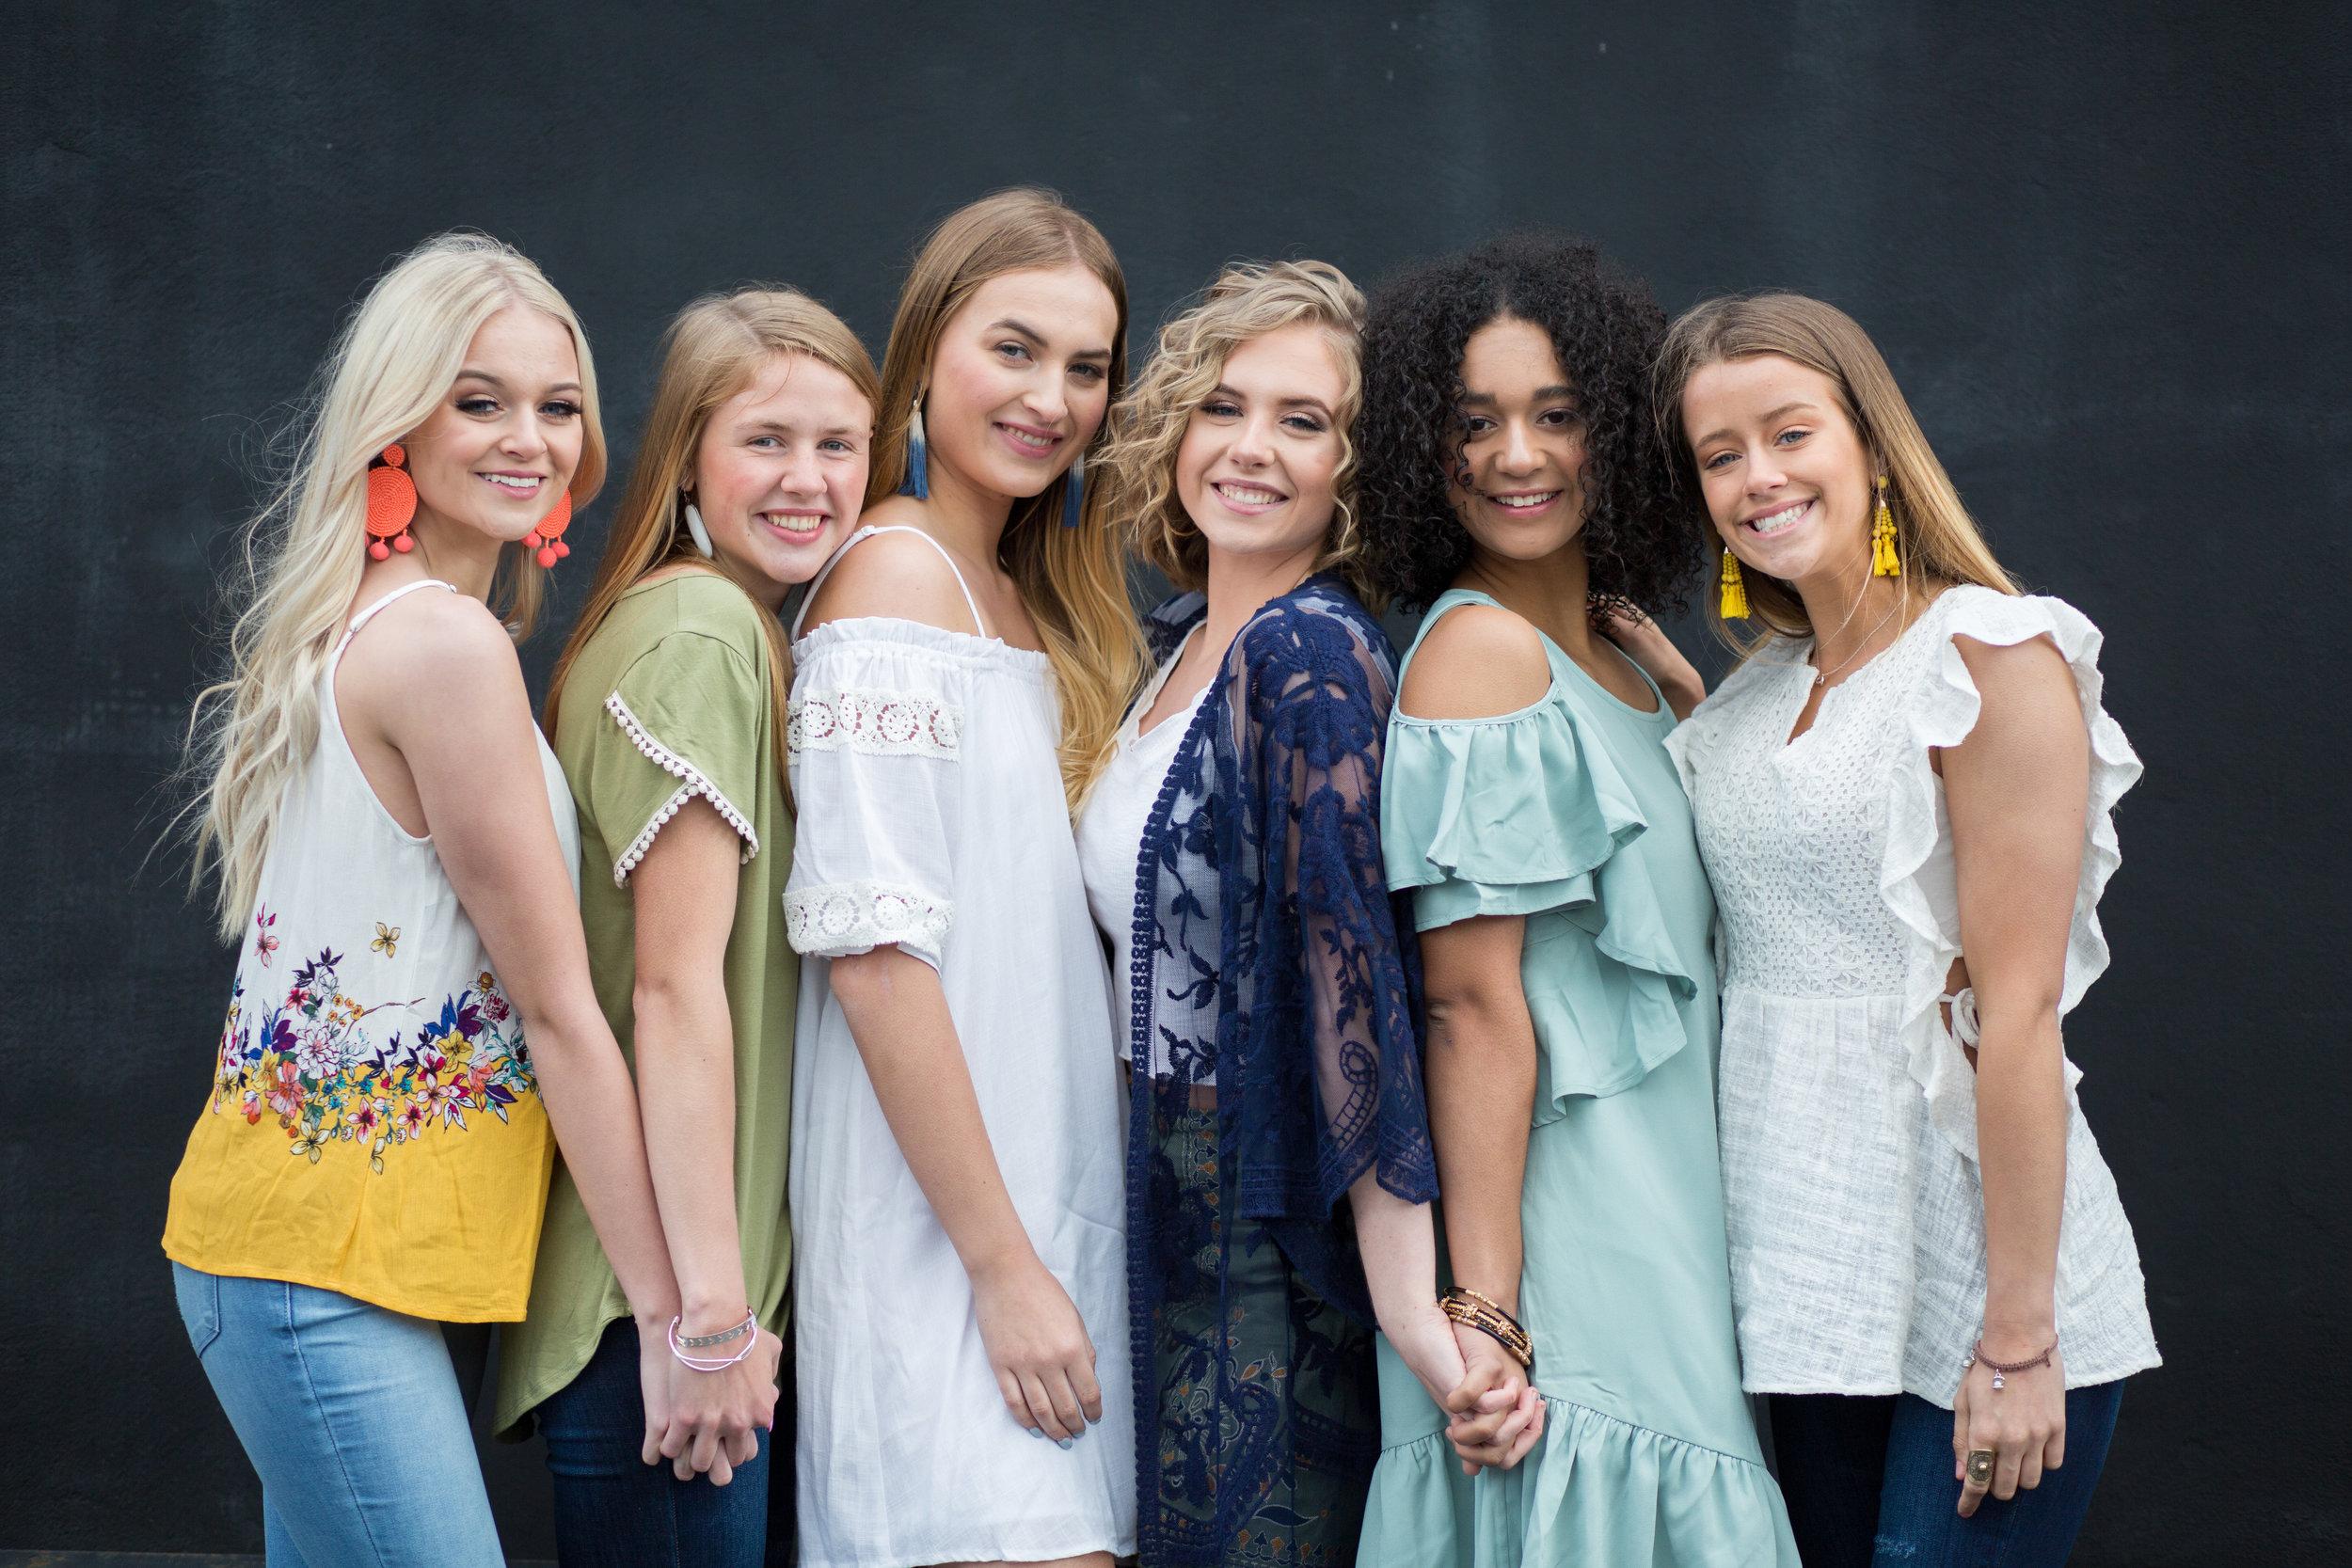 Pretty Team 20's Spring Fashion Photo Shoot, featuring Black & Bush Boutique's clothing line